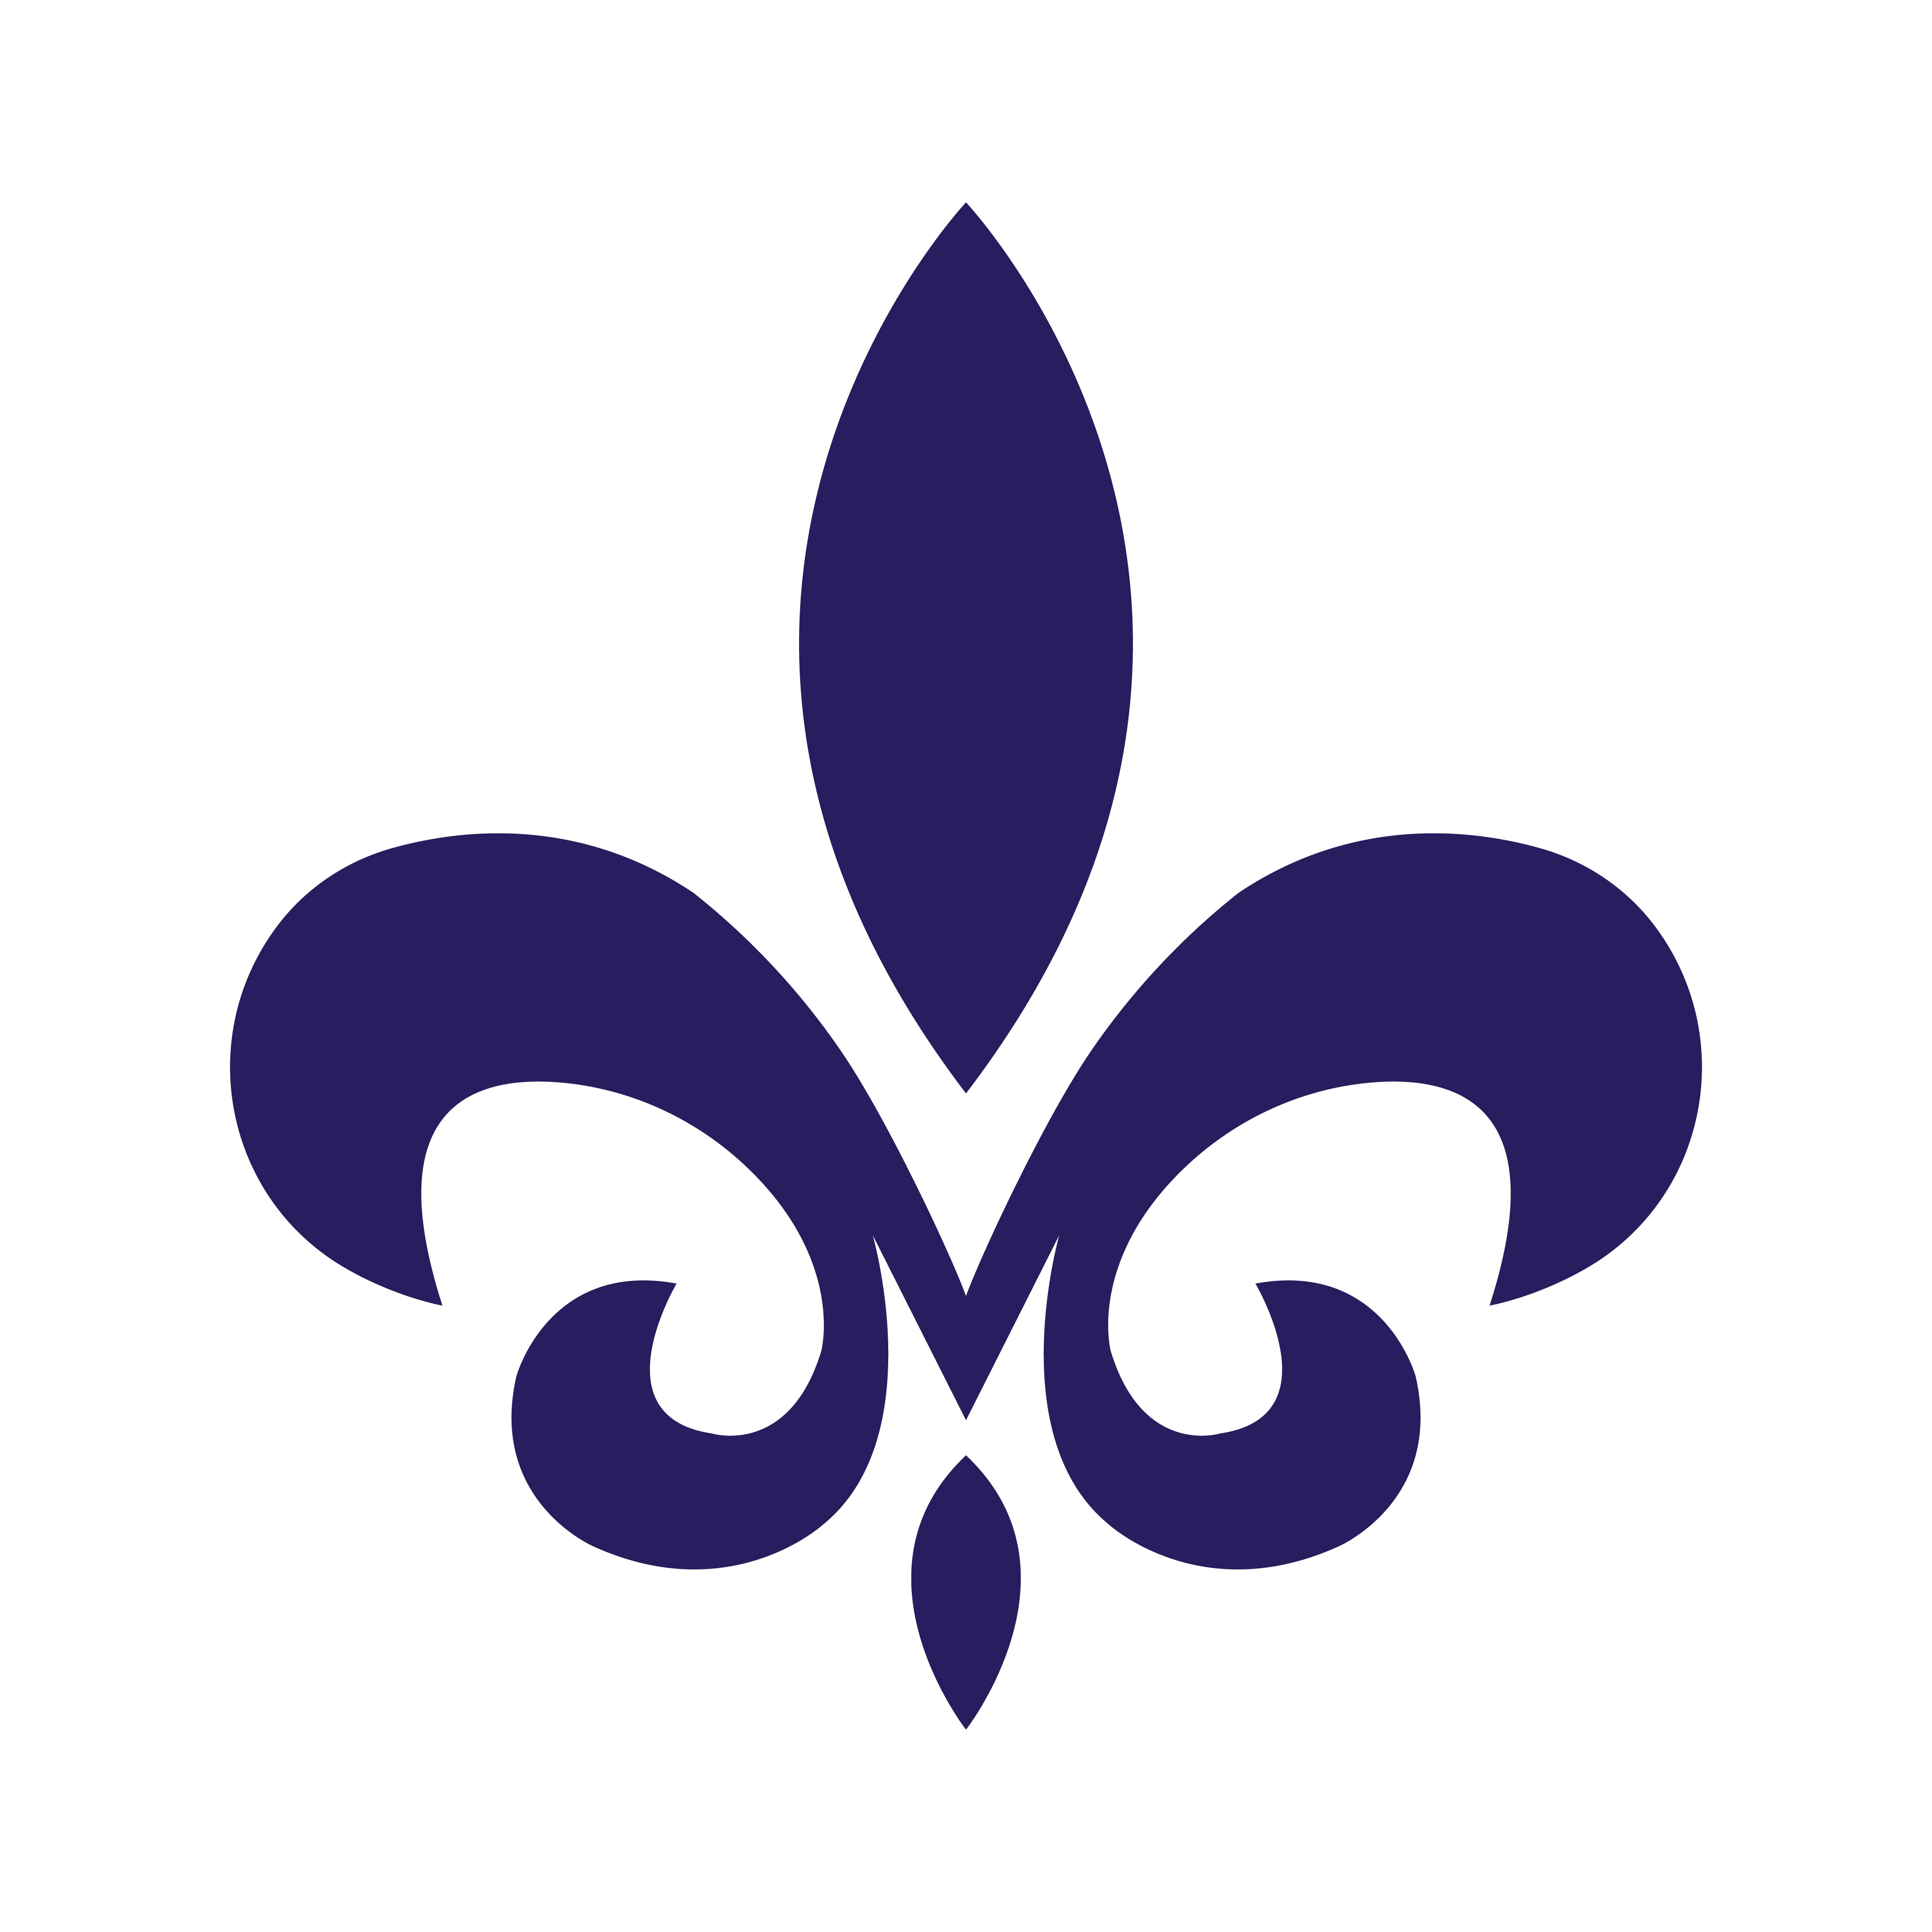 Montreal Expos Concept